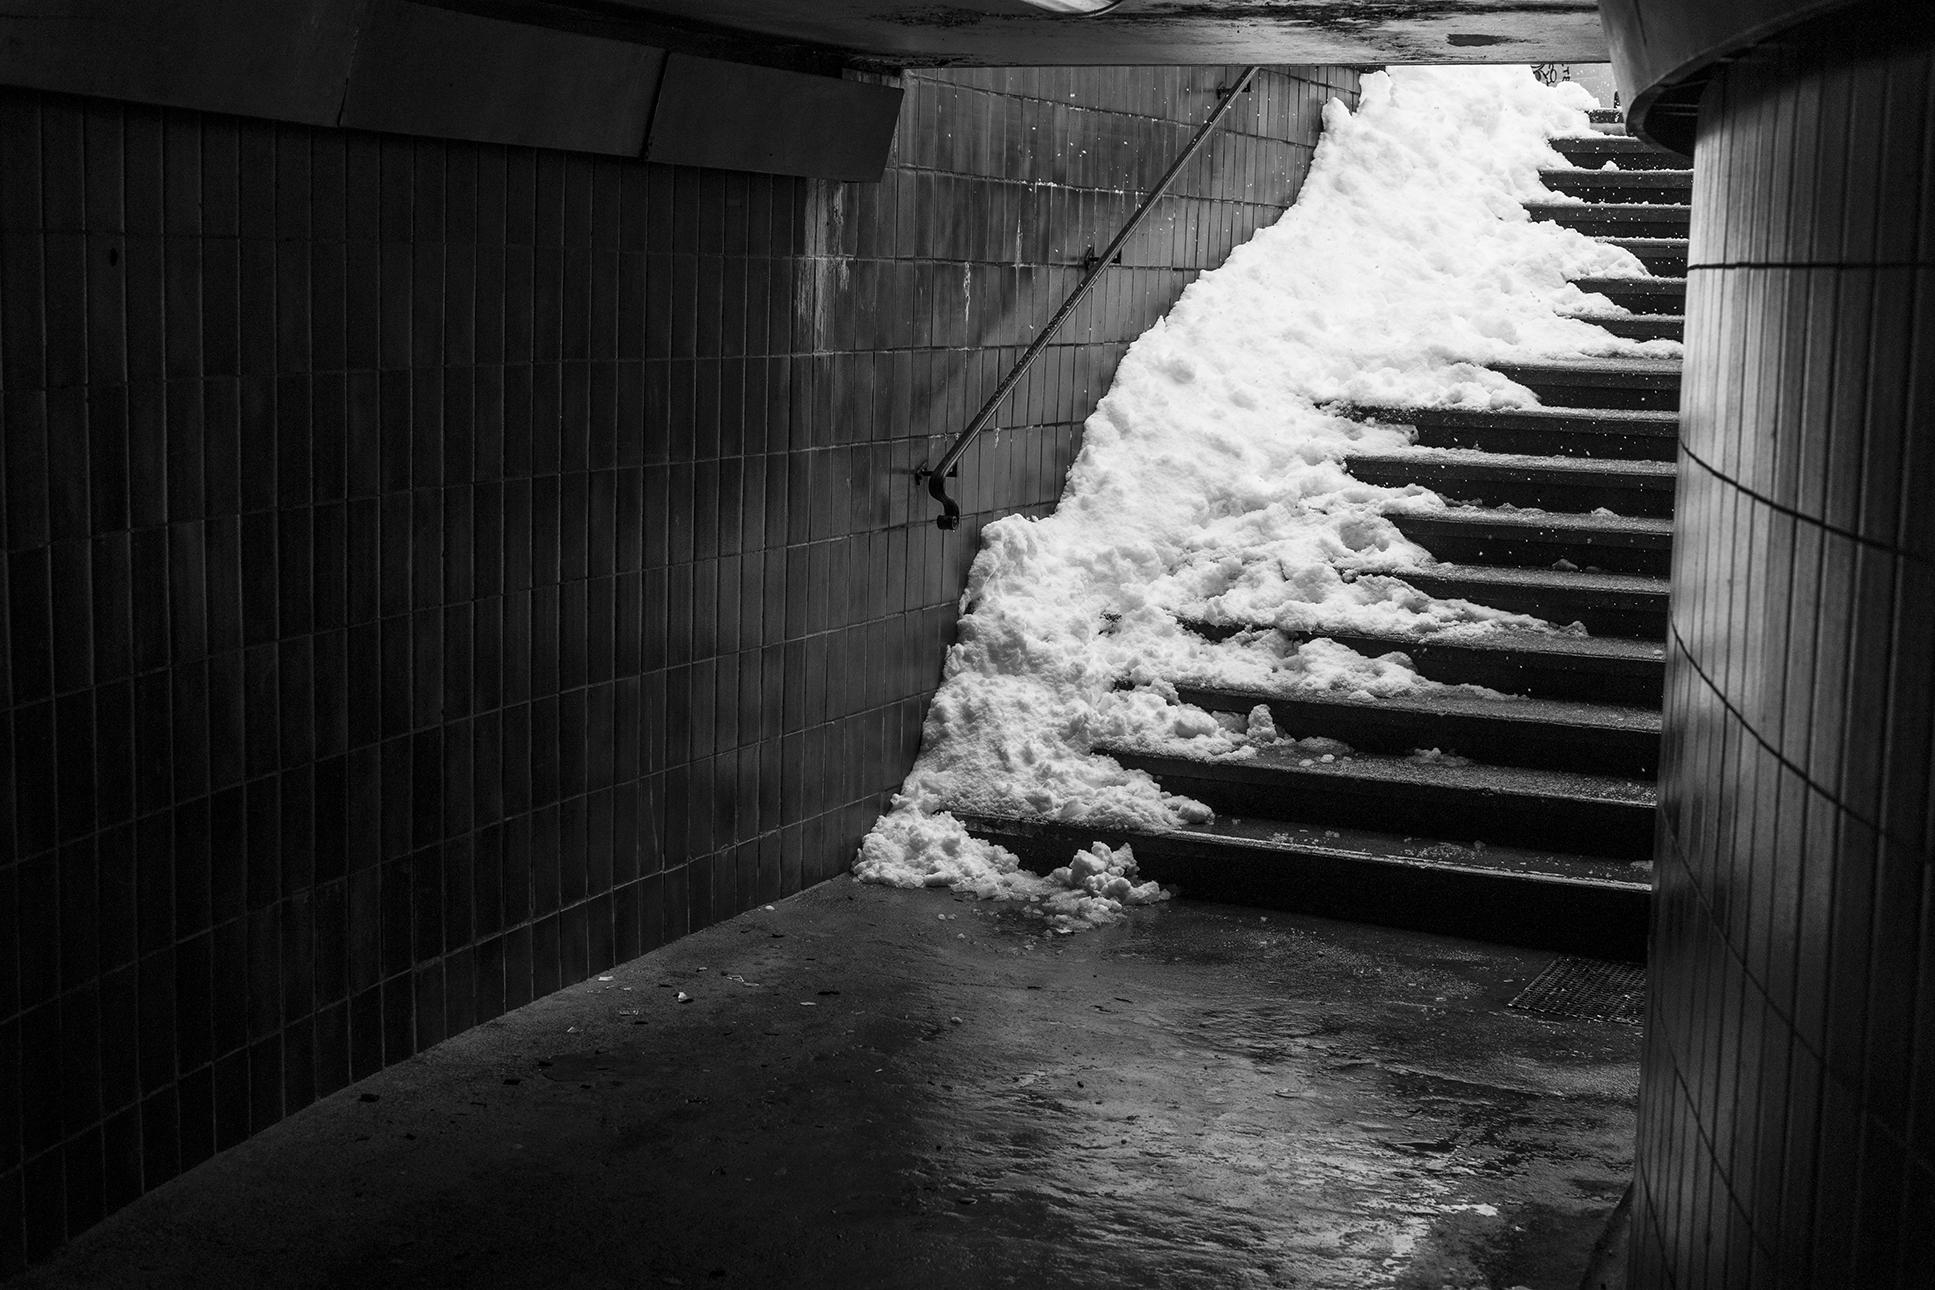 tunnel enneige-Annecy-fevrier-2013.jpg